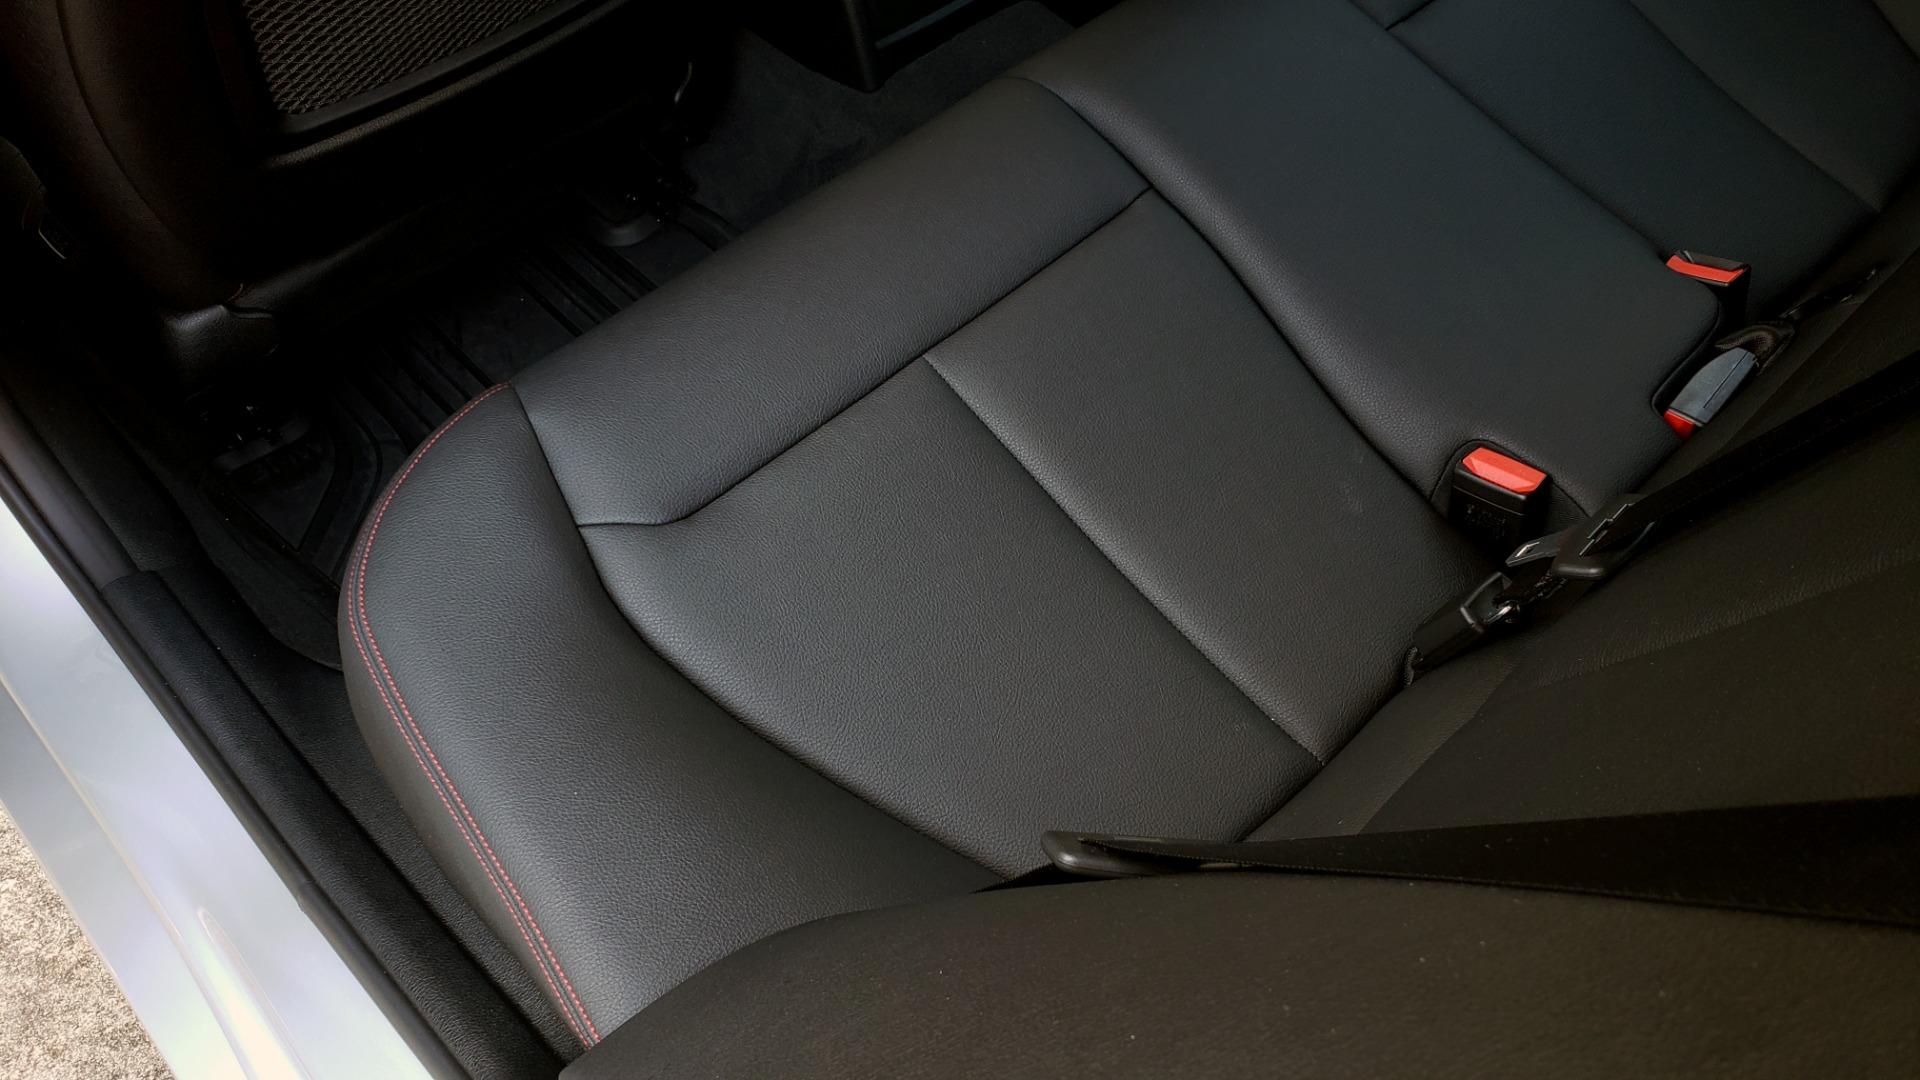 Used 2017 BMW 3 SERIES 330I SPORT SEDAN / DRVR ASST PKG / SUNROOF / REARVIEW for sale Sold at Formula Imports in Charlotte NC 28227 59